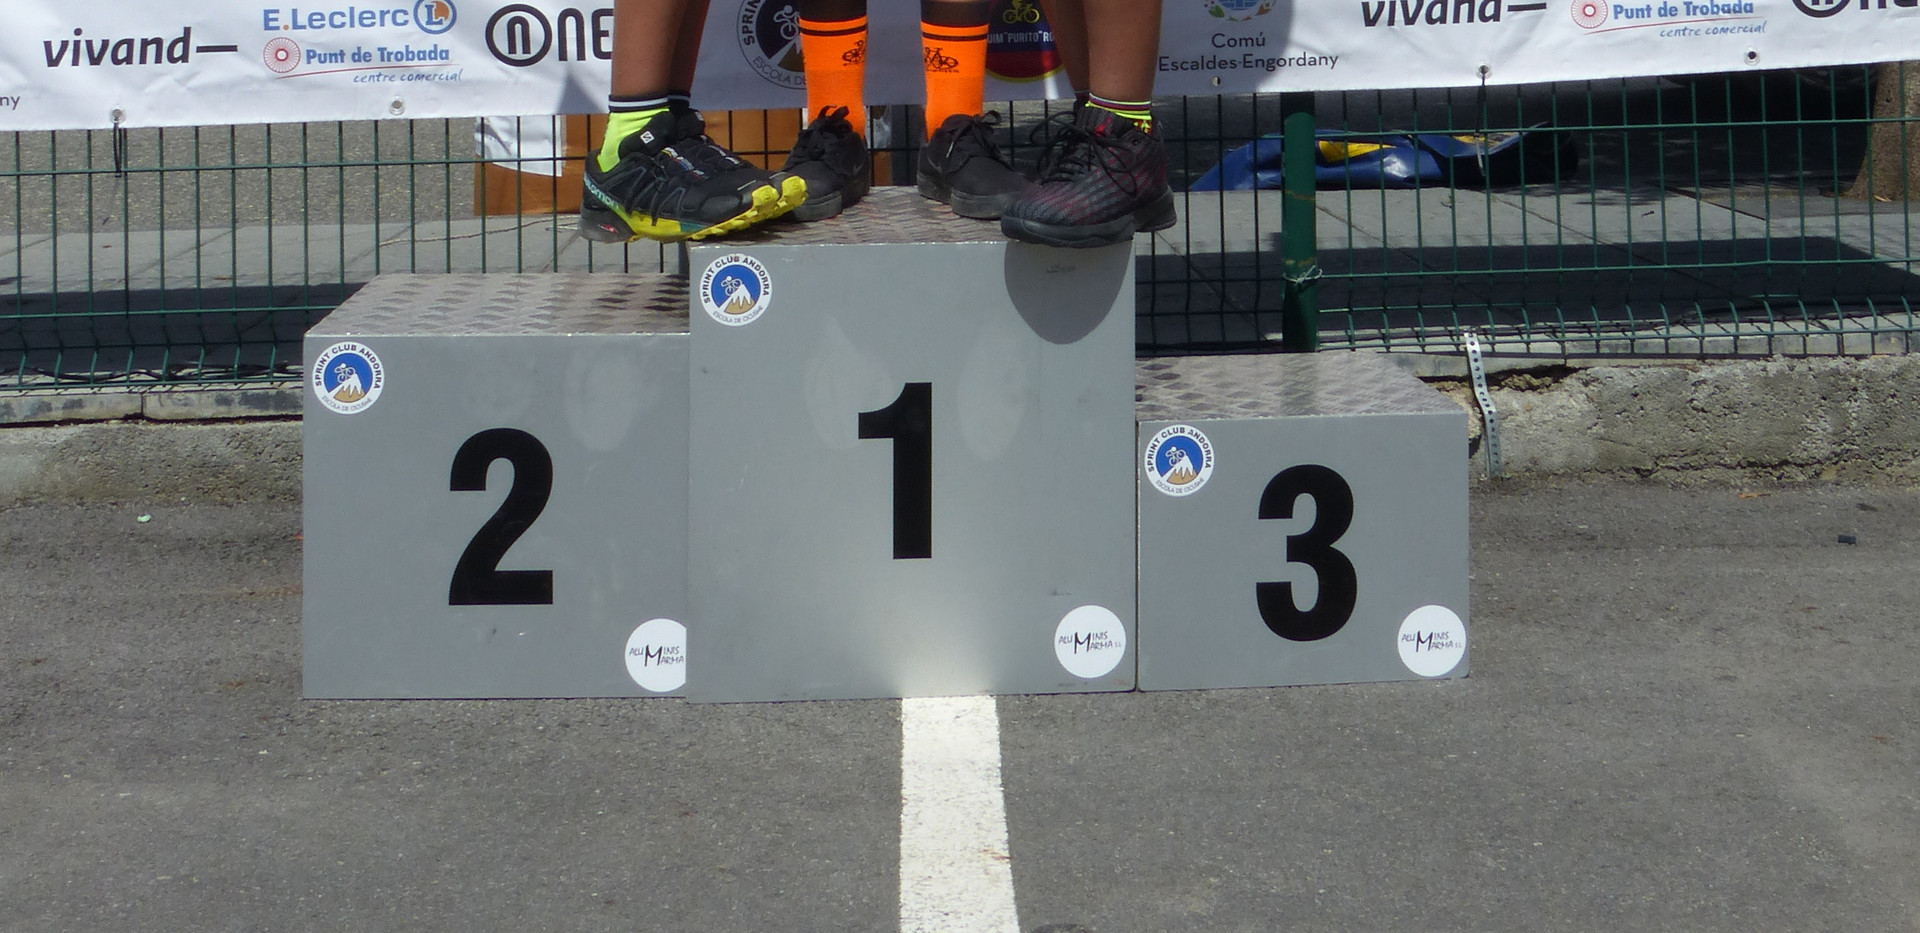 2on GP Purito Rodriguez277.JPG